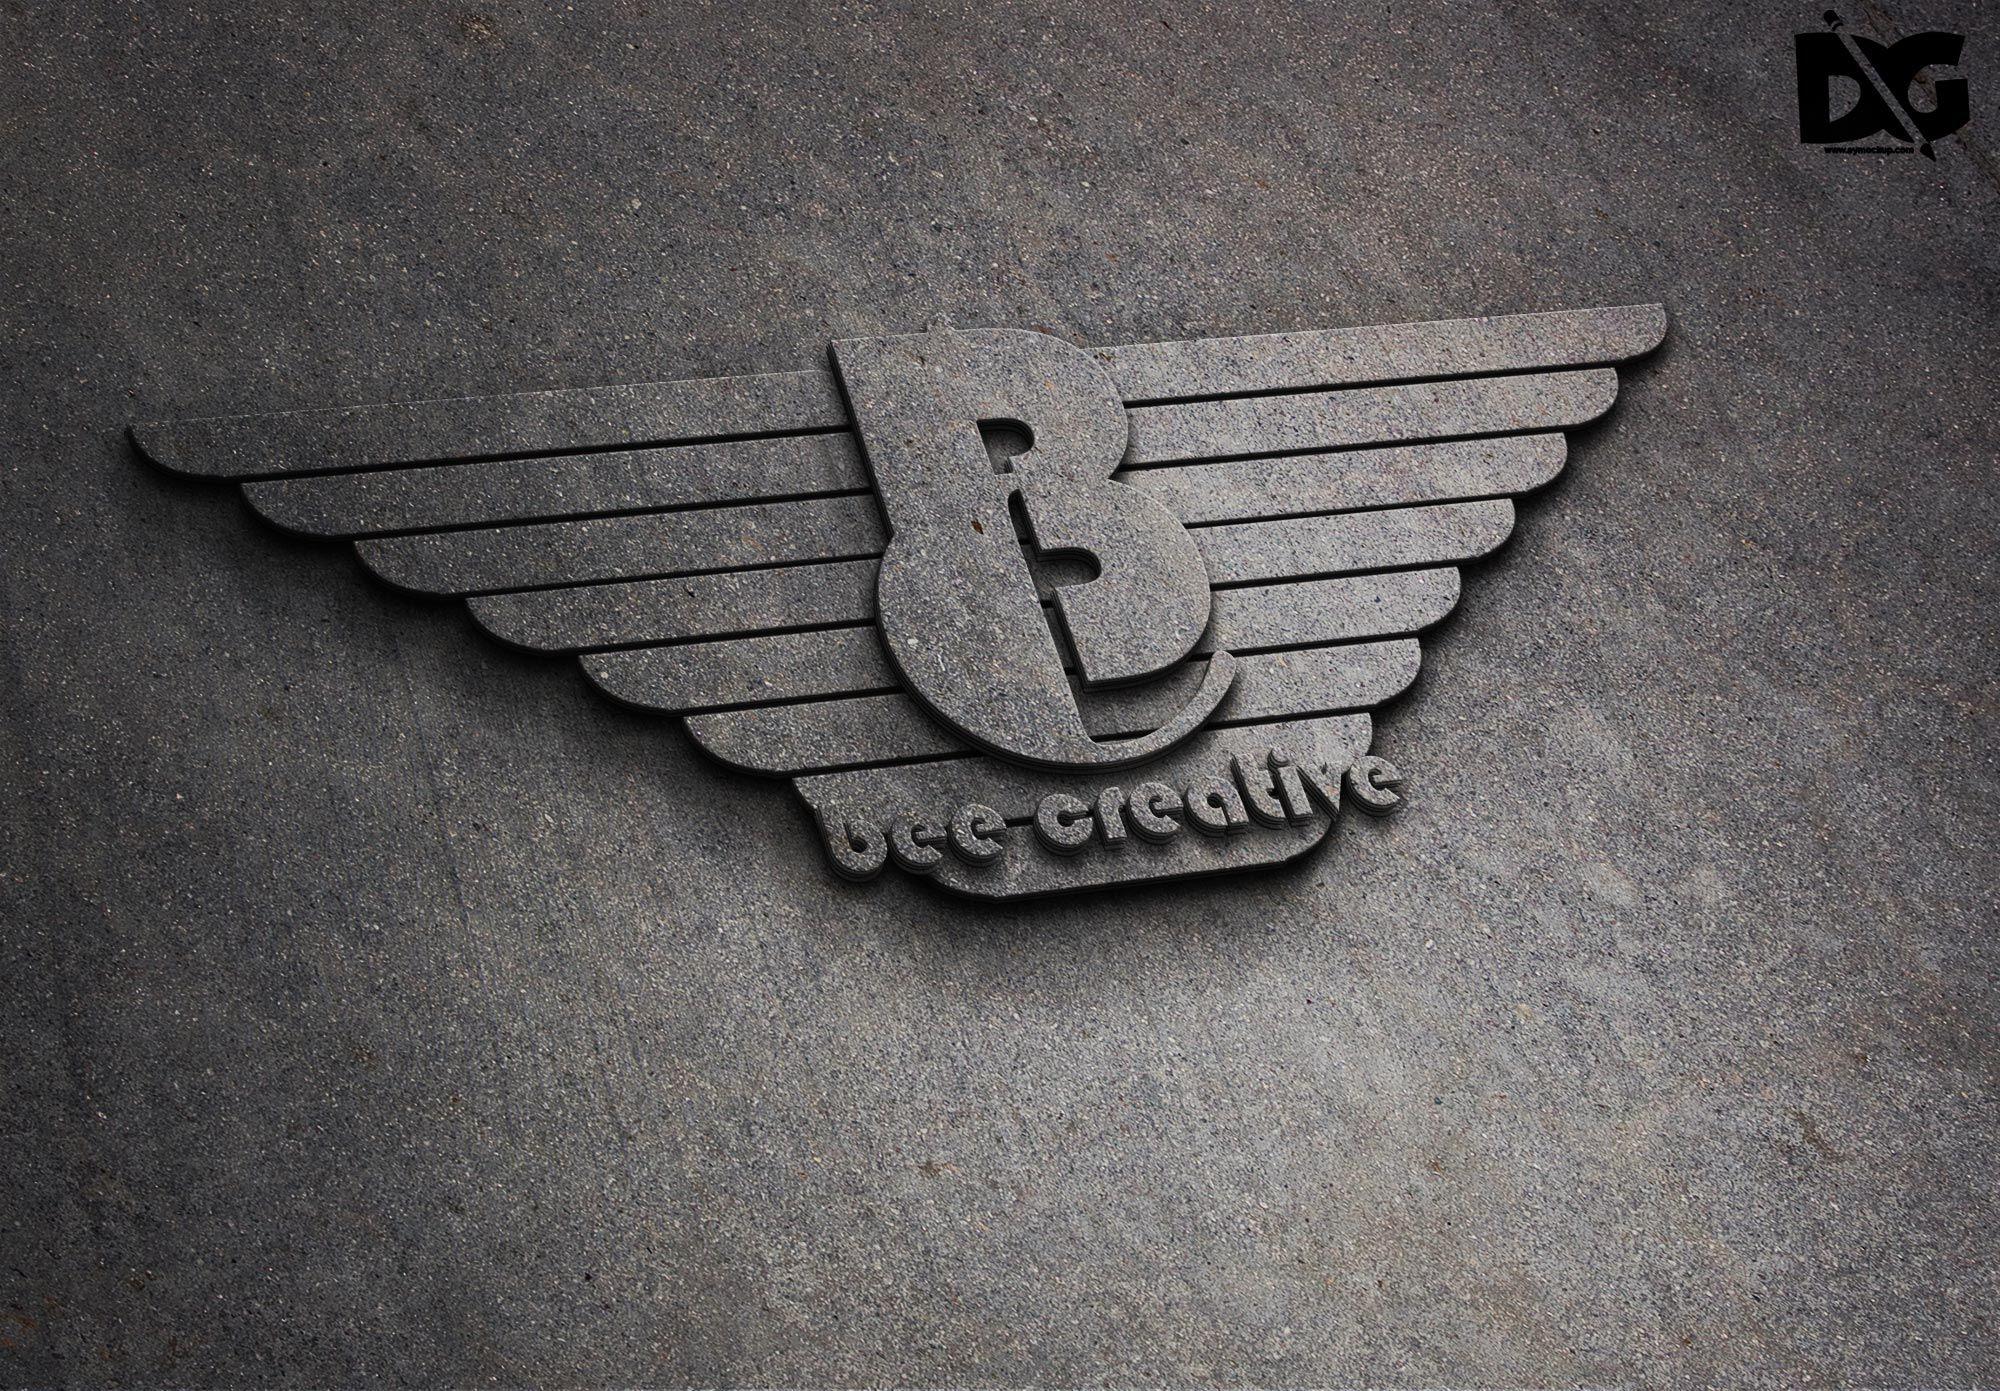 Download Black 3d Metal Psd Logo Mockups Branding Download Downloadpsd Free Freemockup Freepsd Freebie Logomockups Mock Mockup Logo Design Mockup Logo Mockup